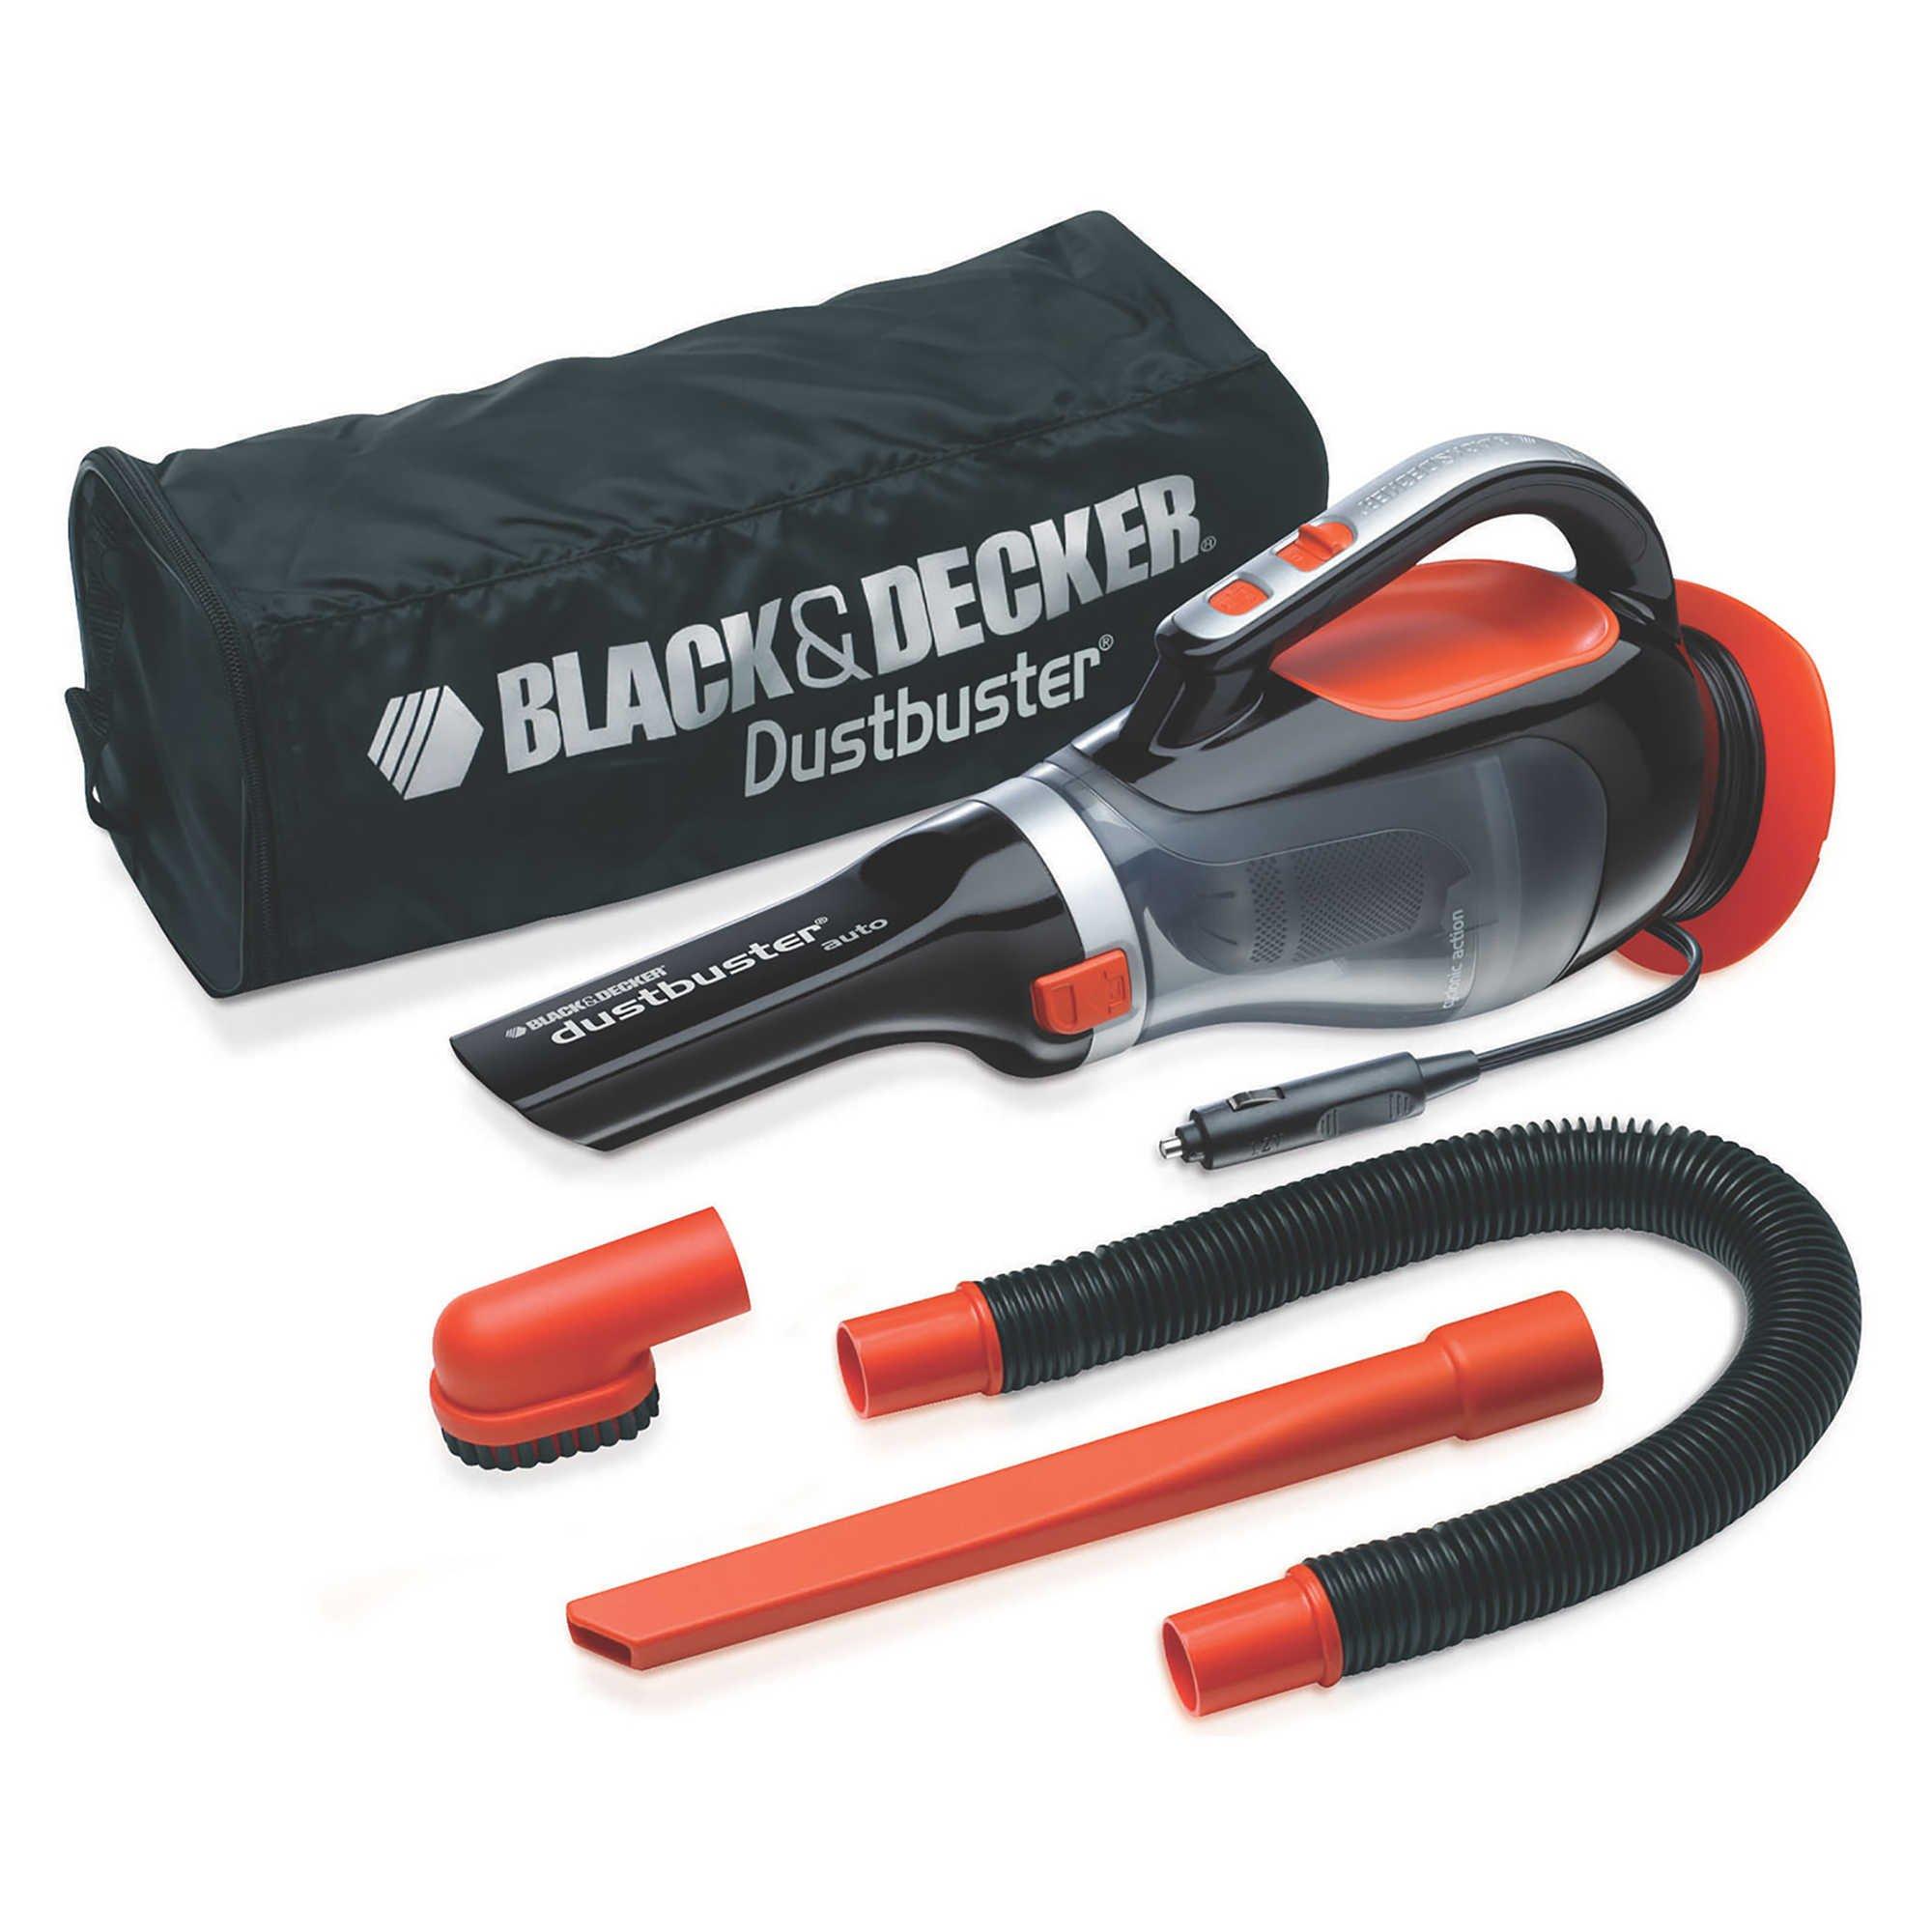 Black & Decker Dustbuster Portable 12V Auto Vacuum in Orange/Black